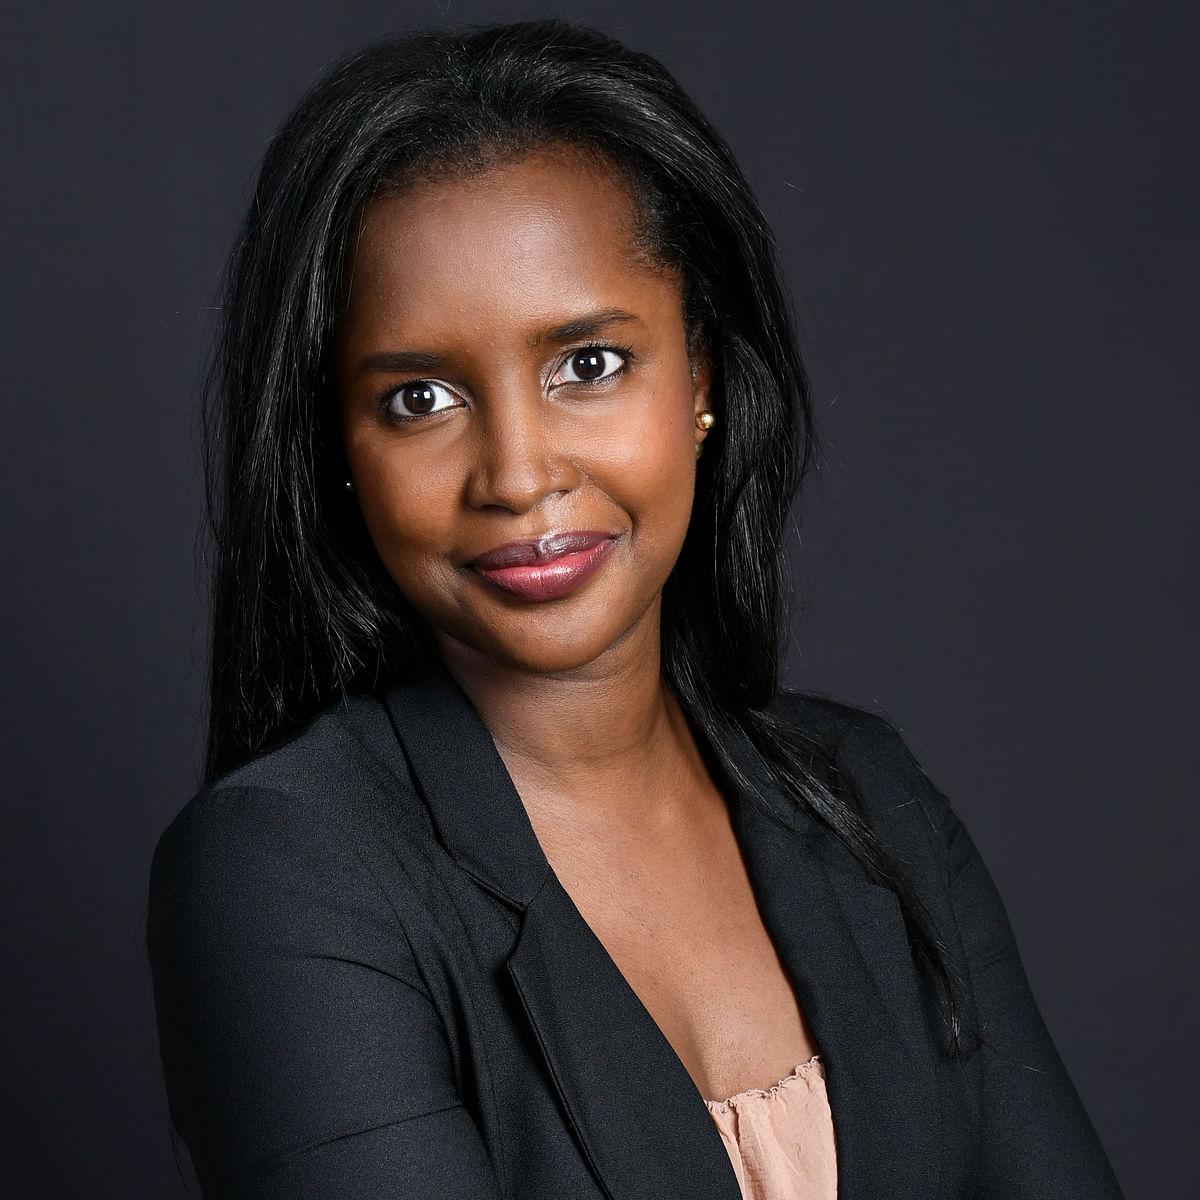 Orange Botswana Welcomes New CEO, Néné Maïga